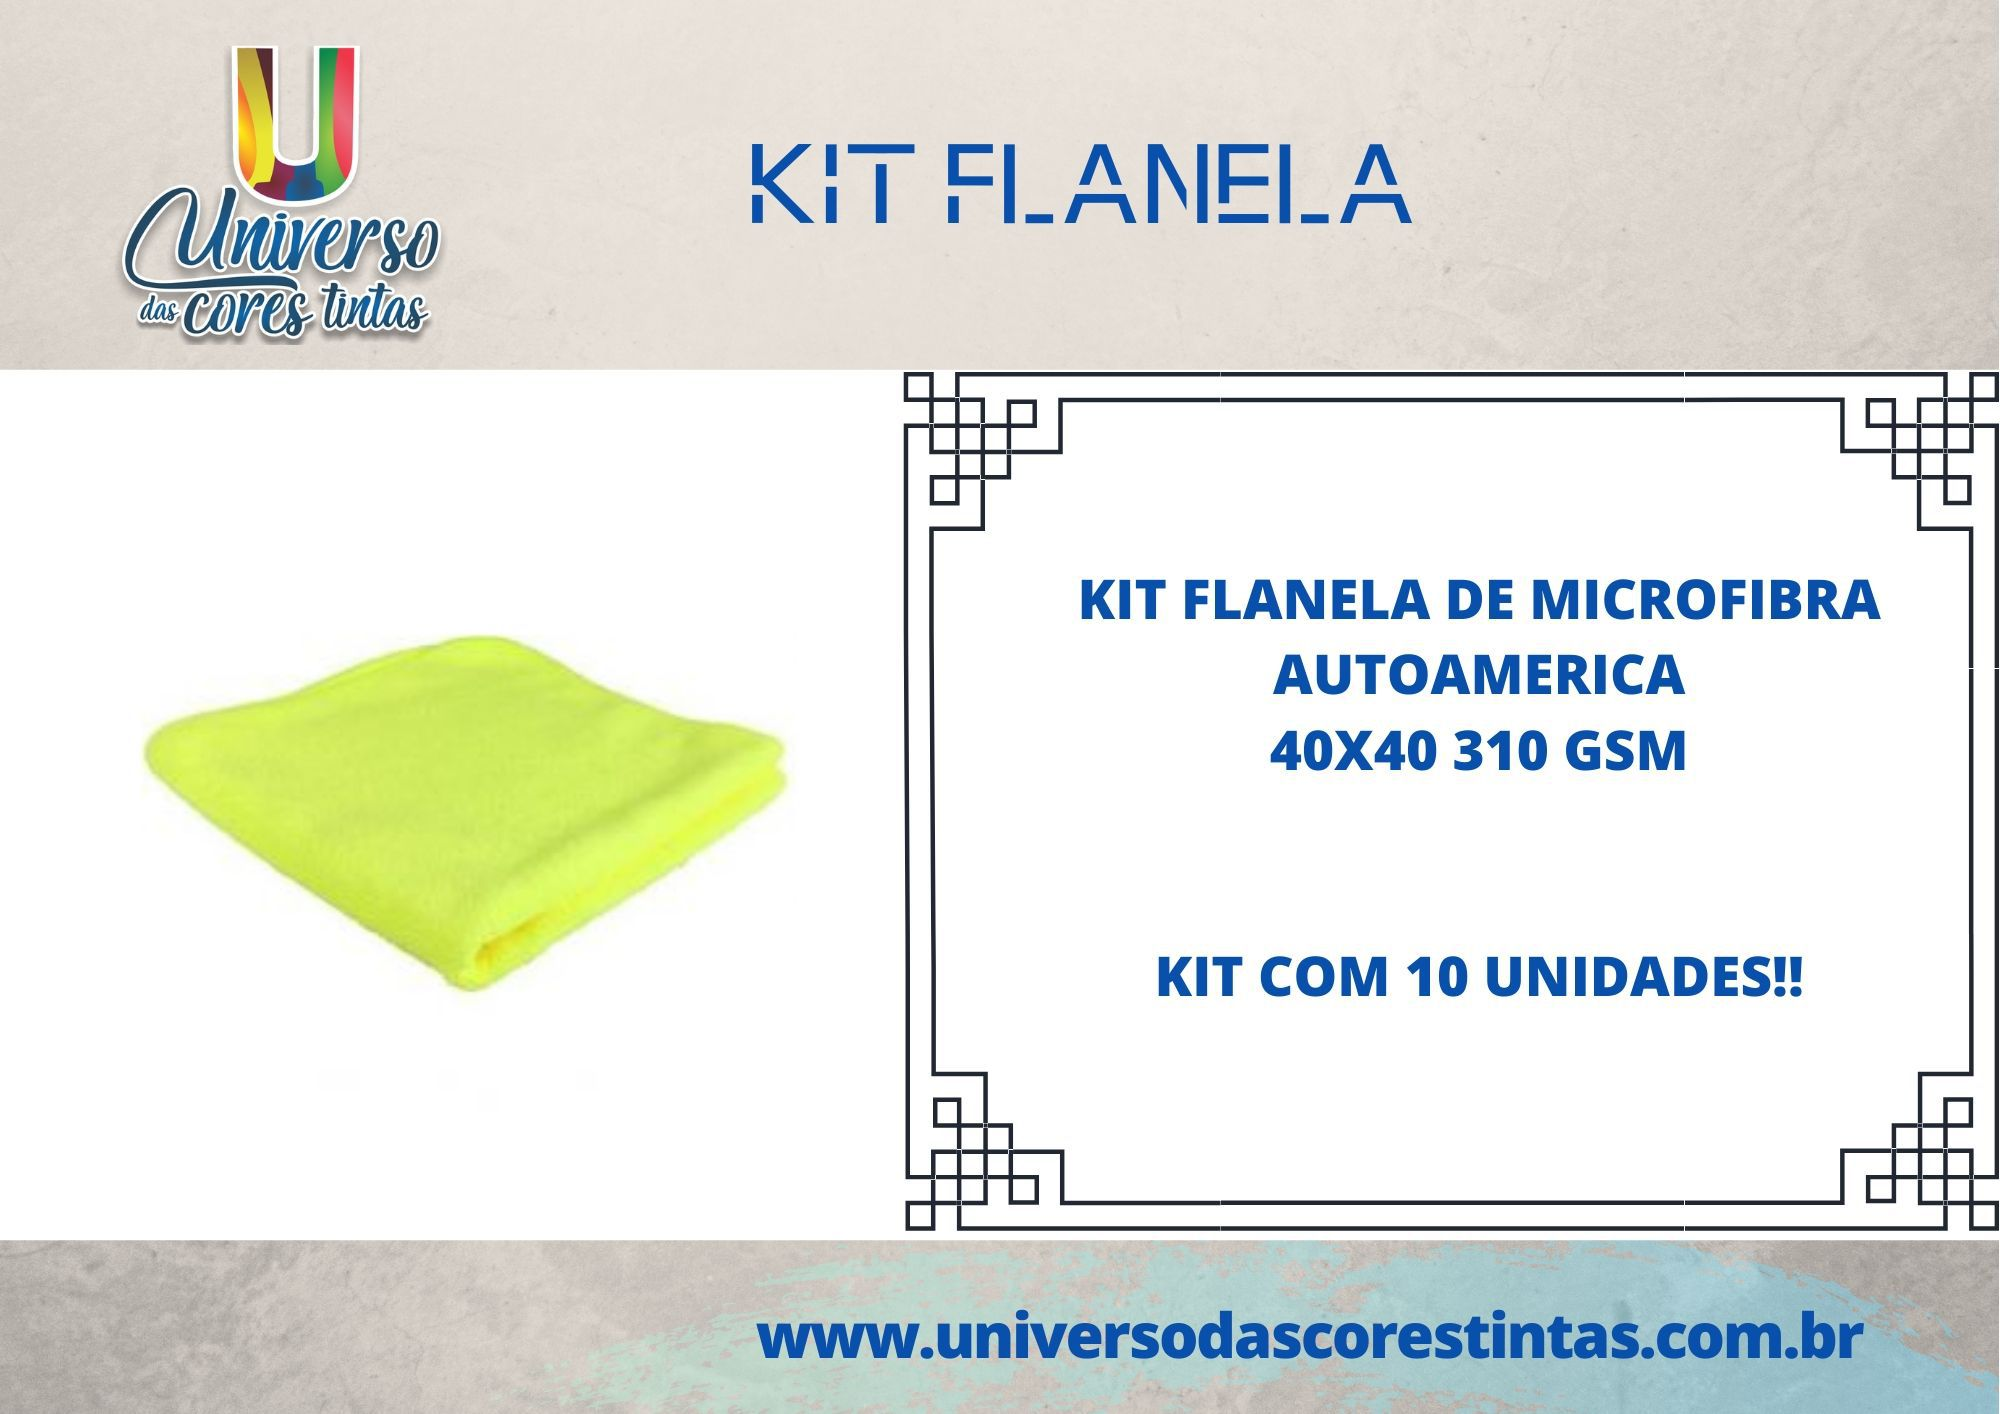 Kit de Flanela de Microfibra 40x40 310 GSM Autoamerica (10 Unidades)